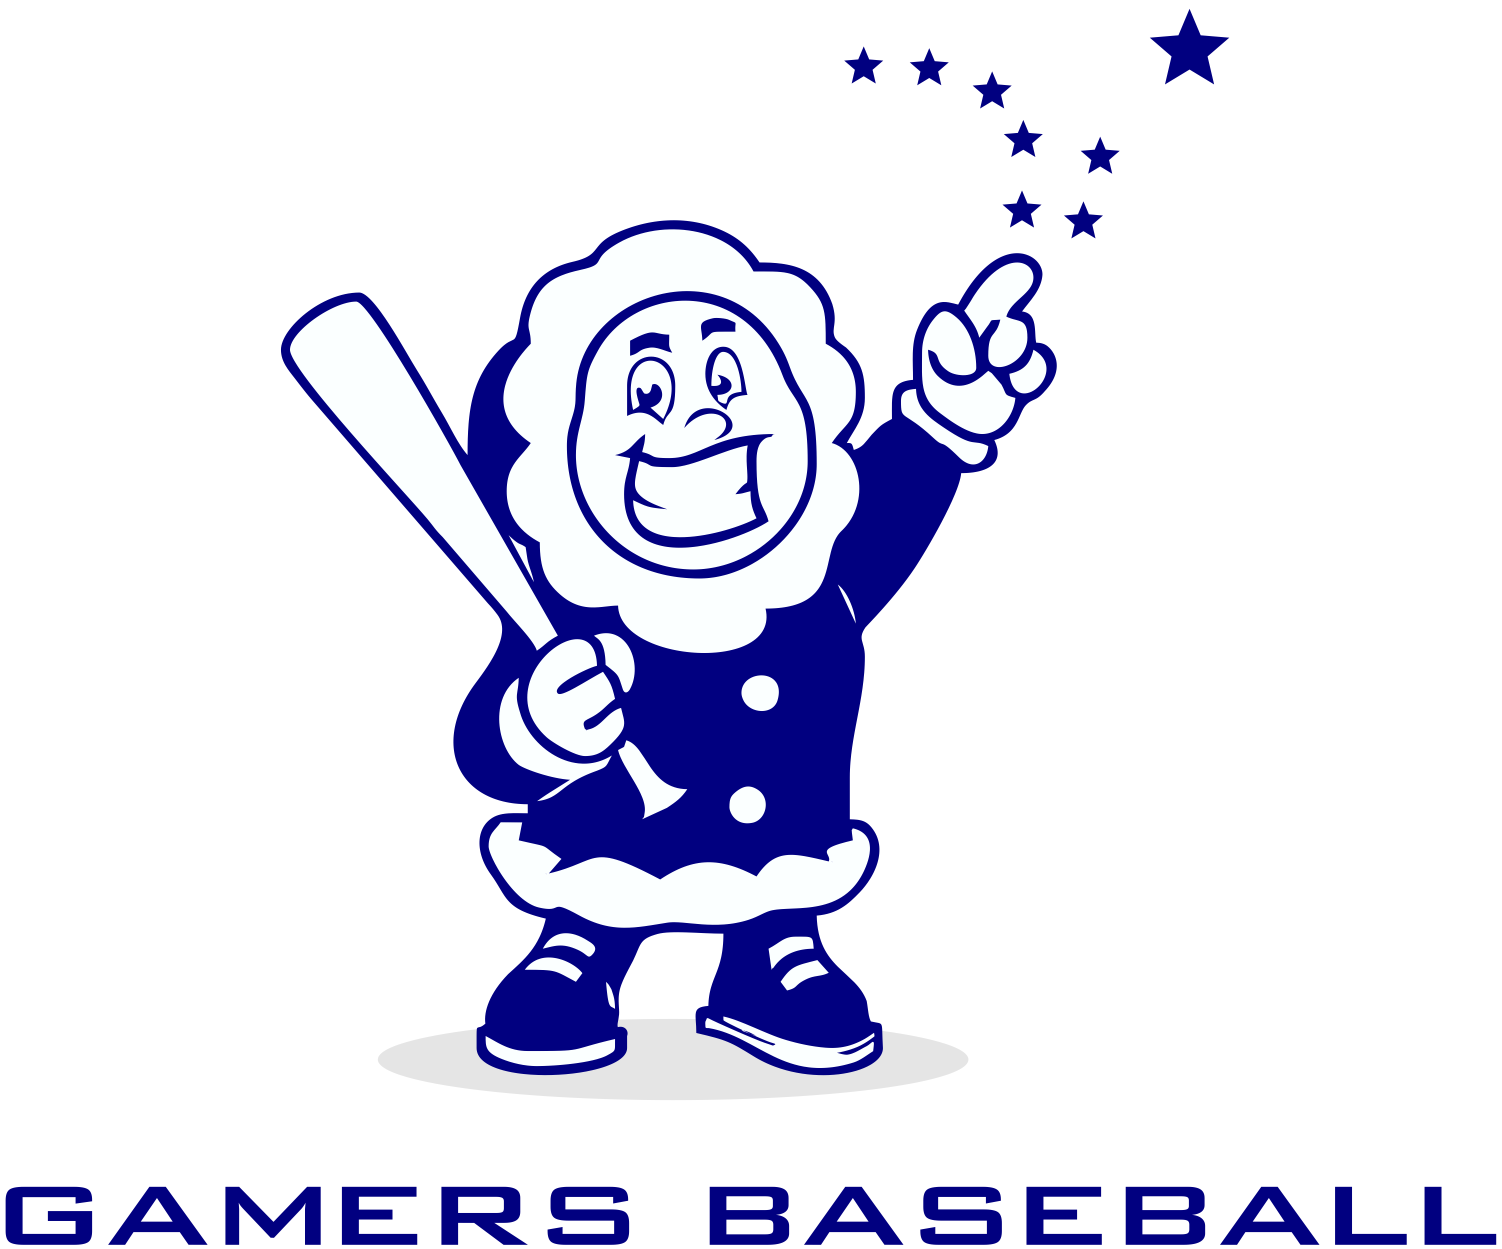 Gamers Baseball/Softball Instruction